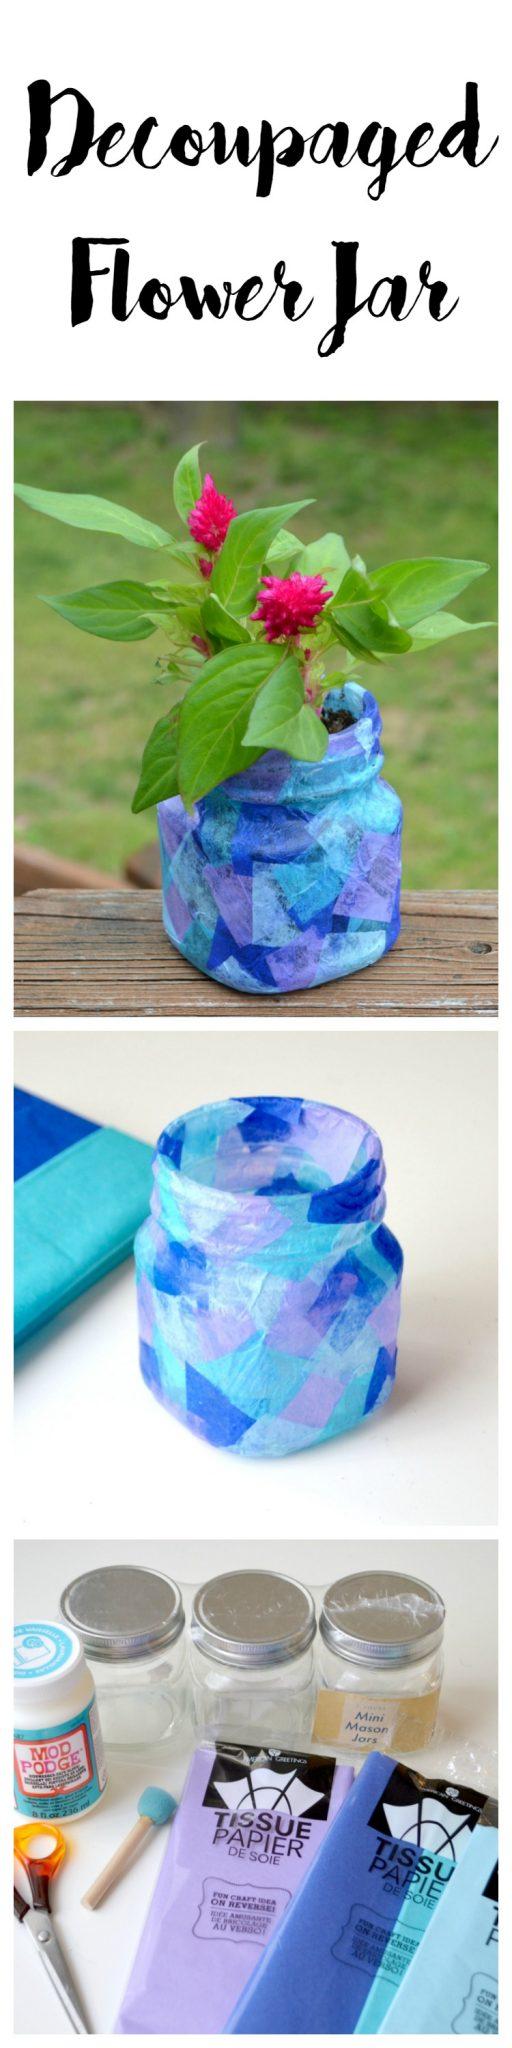 Decoupaged Flower Jar